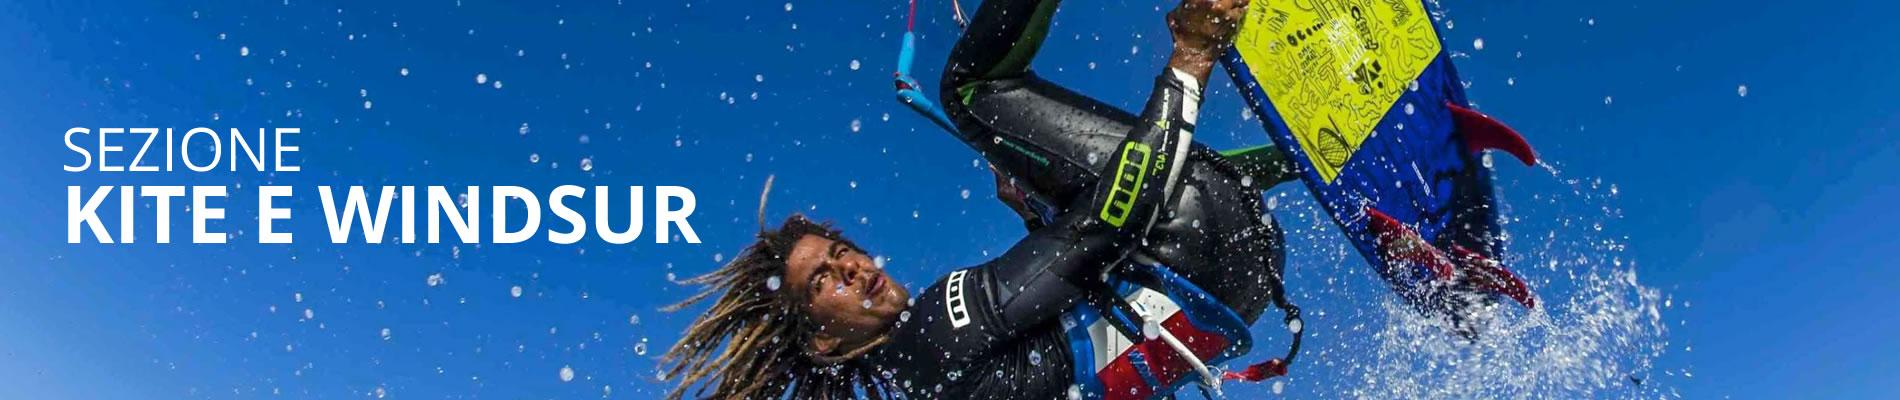 Kite-Windsurf